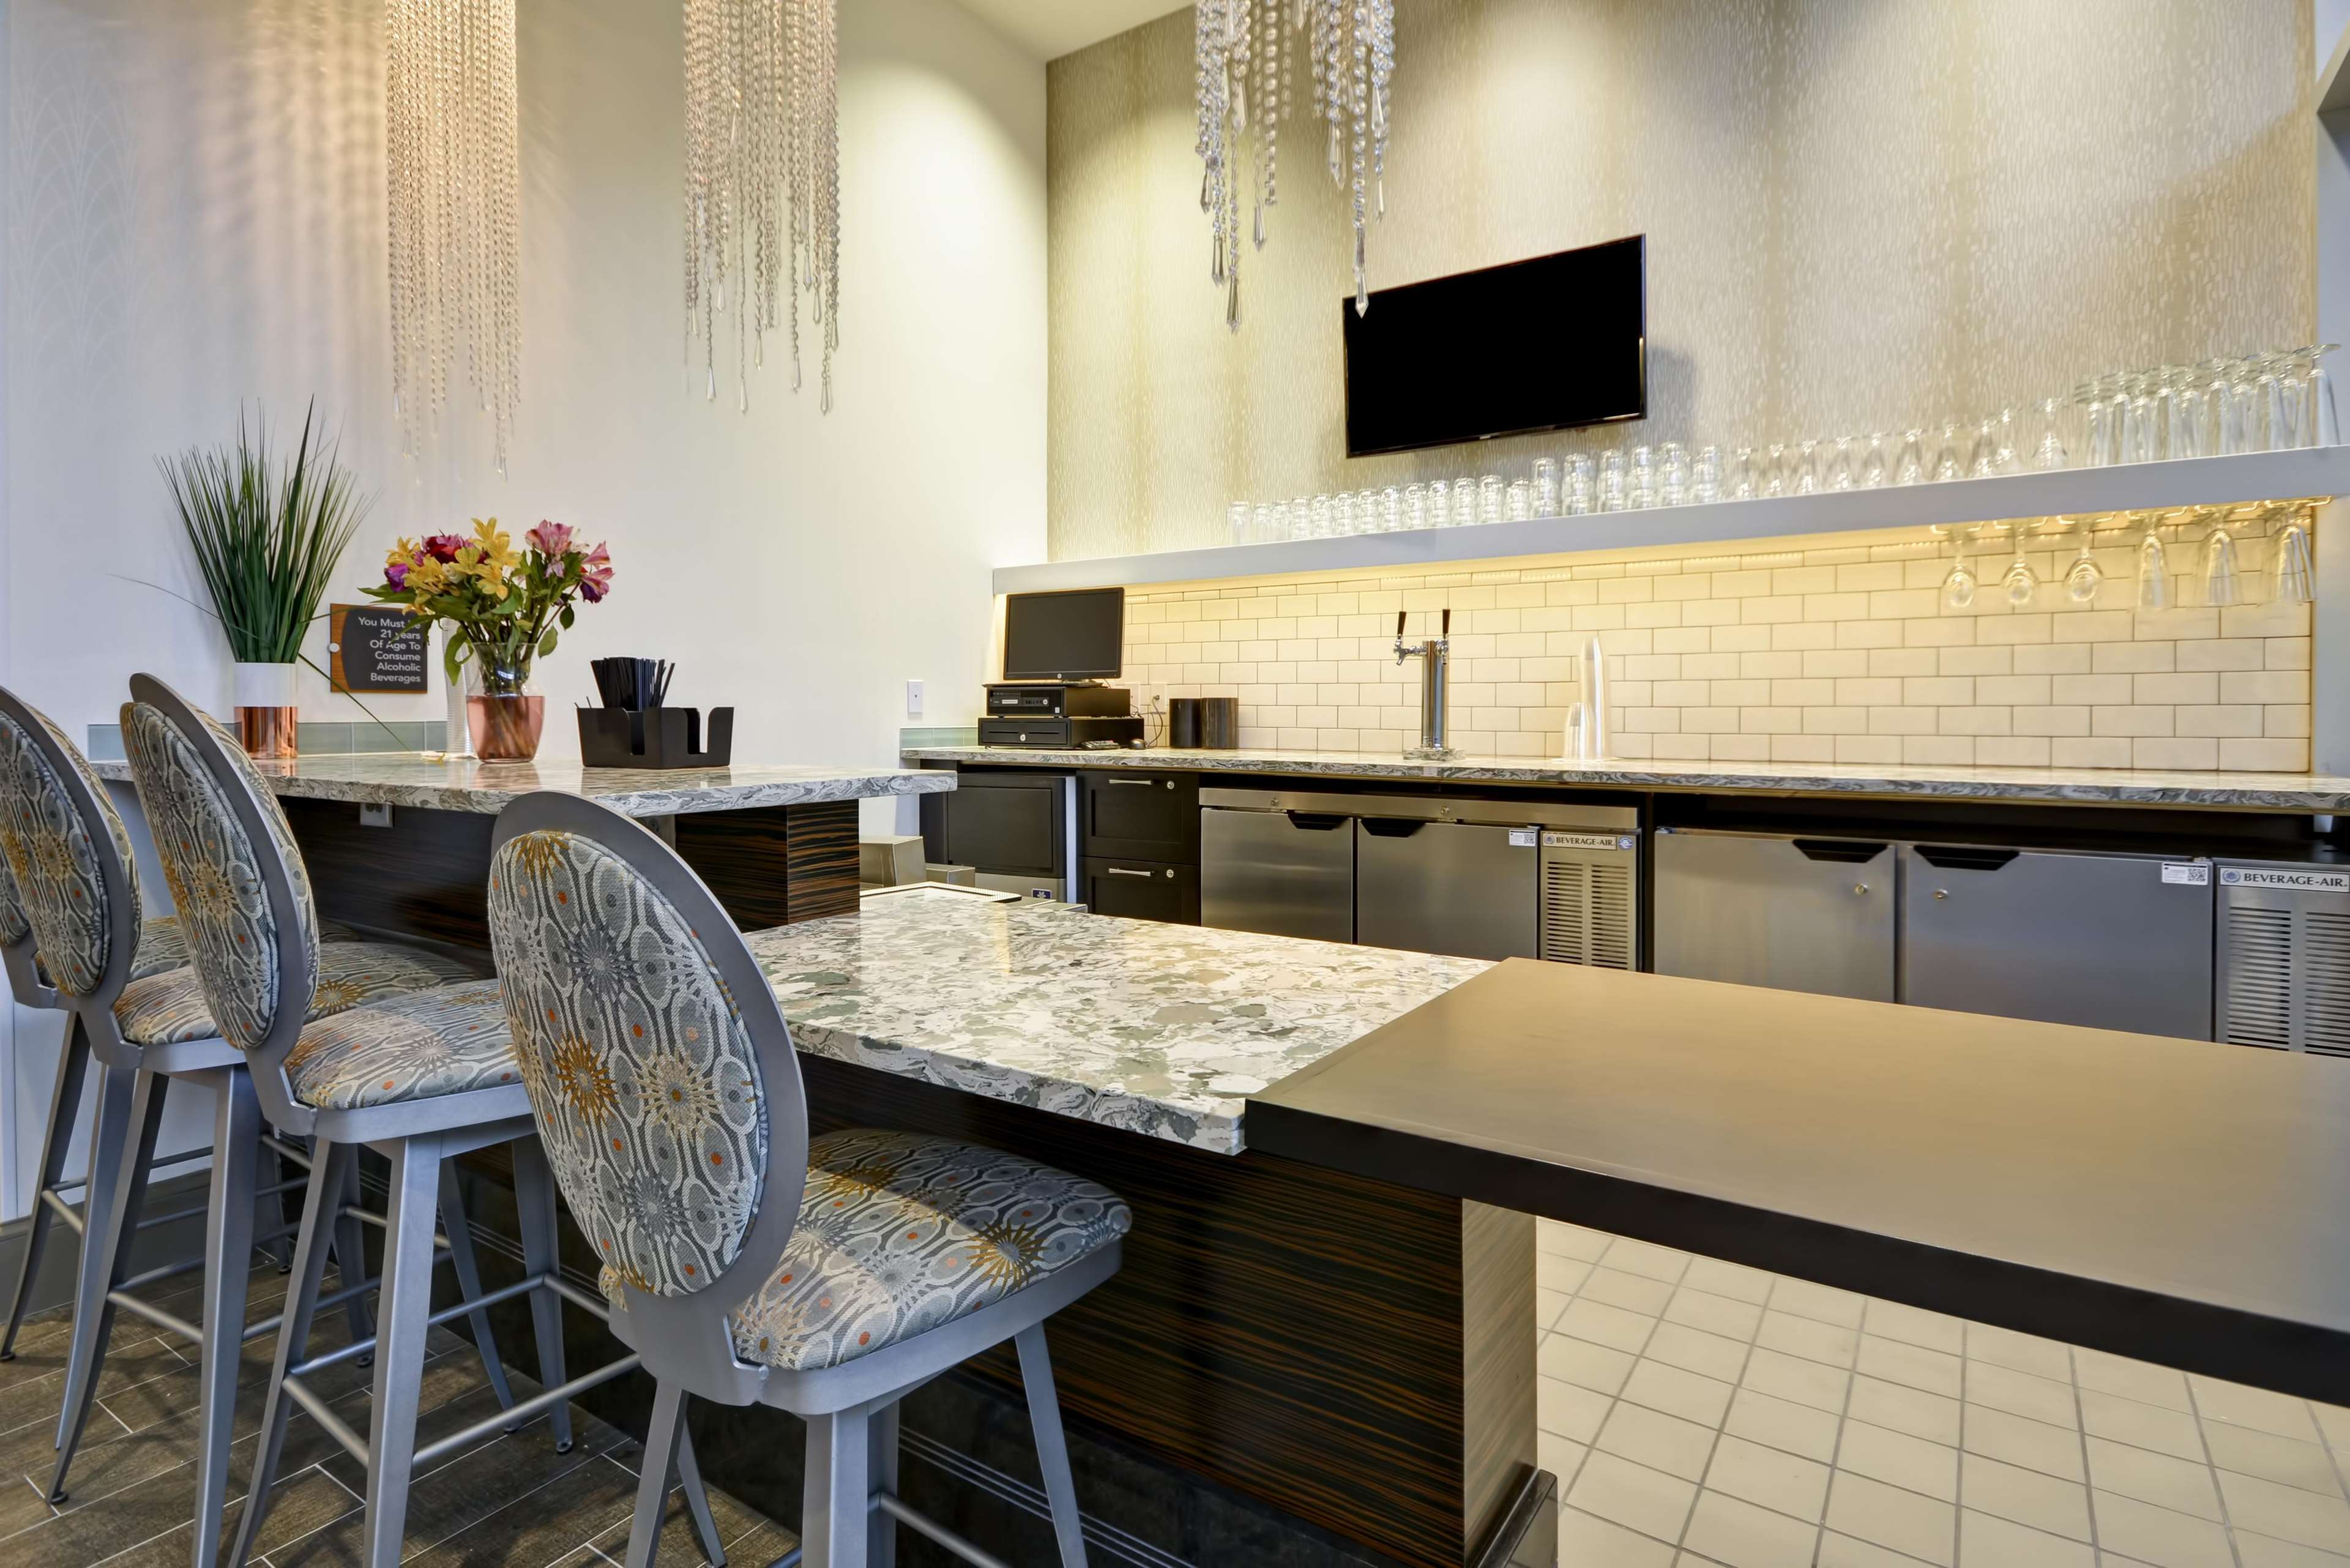 Homewood Suites by Hilton Birmingham Downtown Near UAB image 24